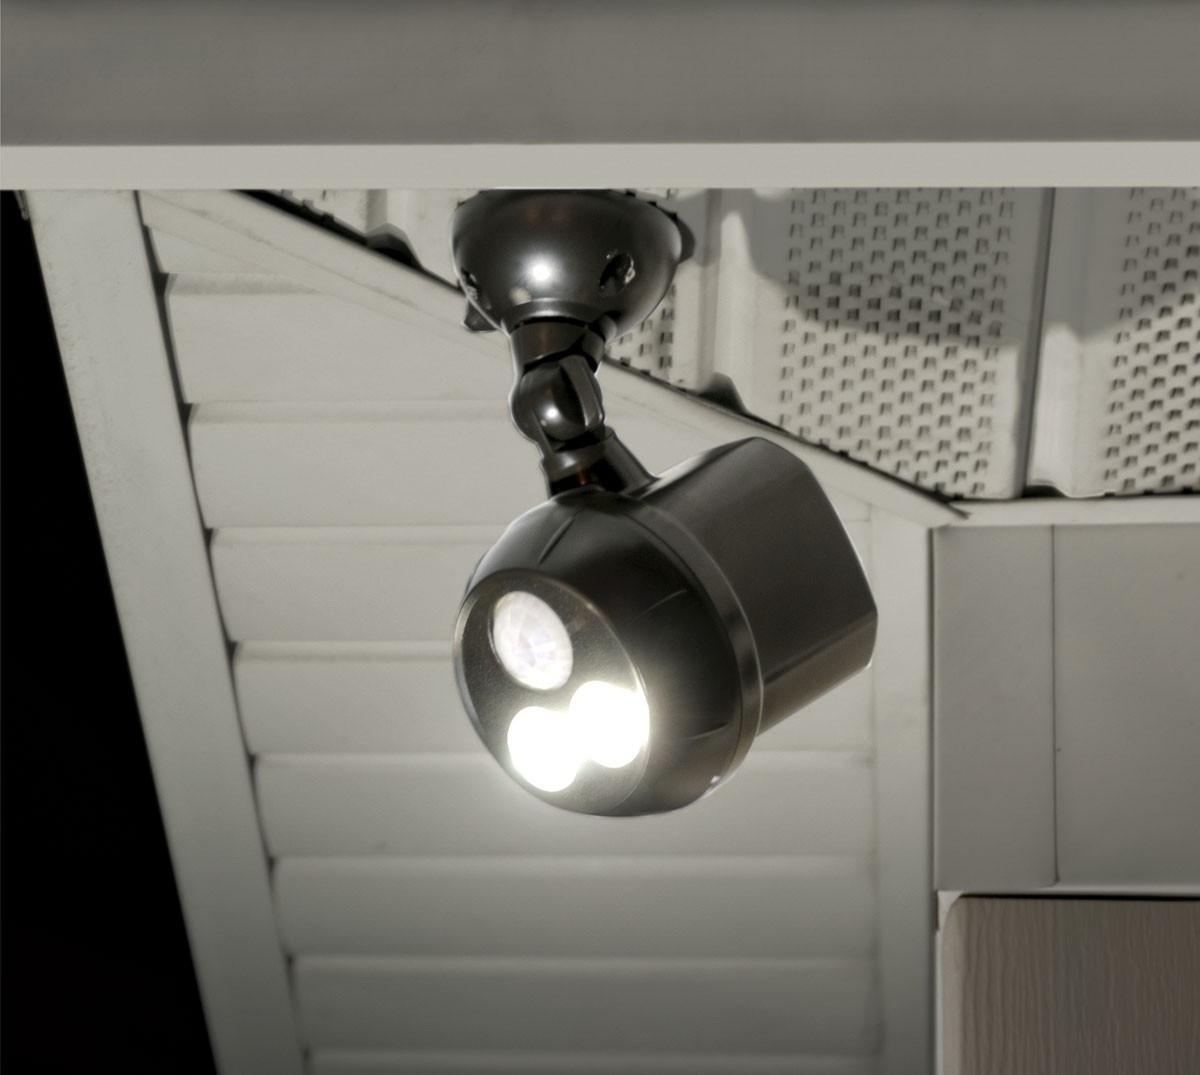 Motion Sensor Outdoor Lights Battery • Outdoor Lighting Regarding Most Recently Released Outdoor Ceiling Security Lights (View 10 of 20)